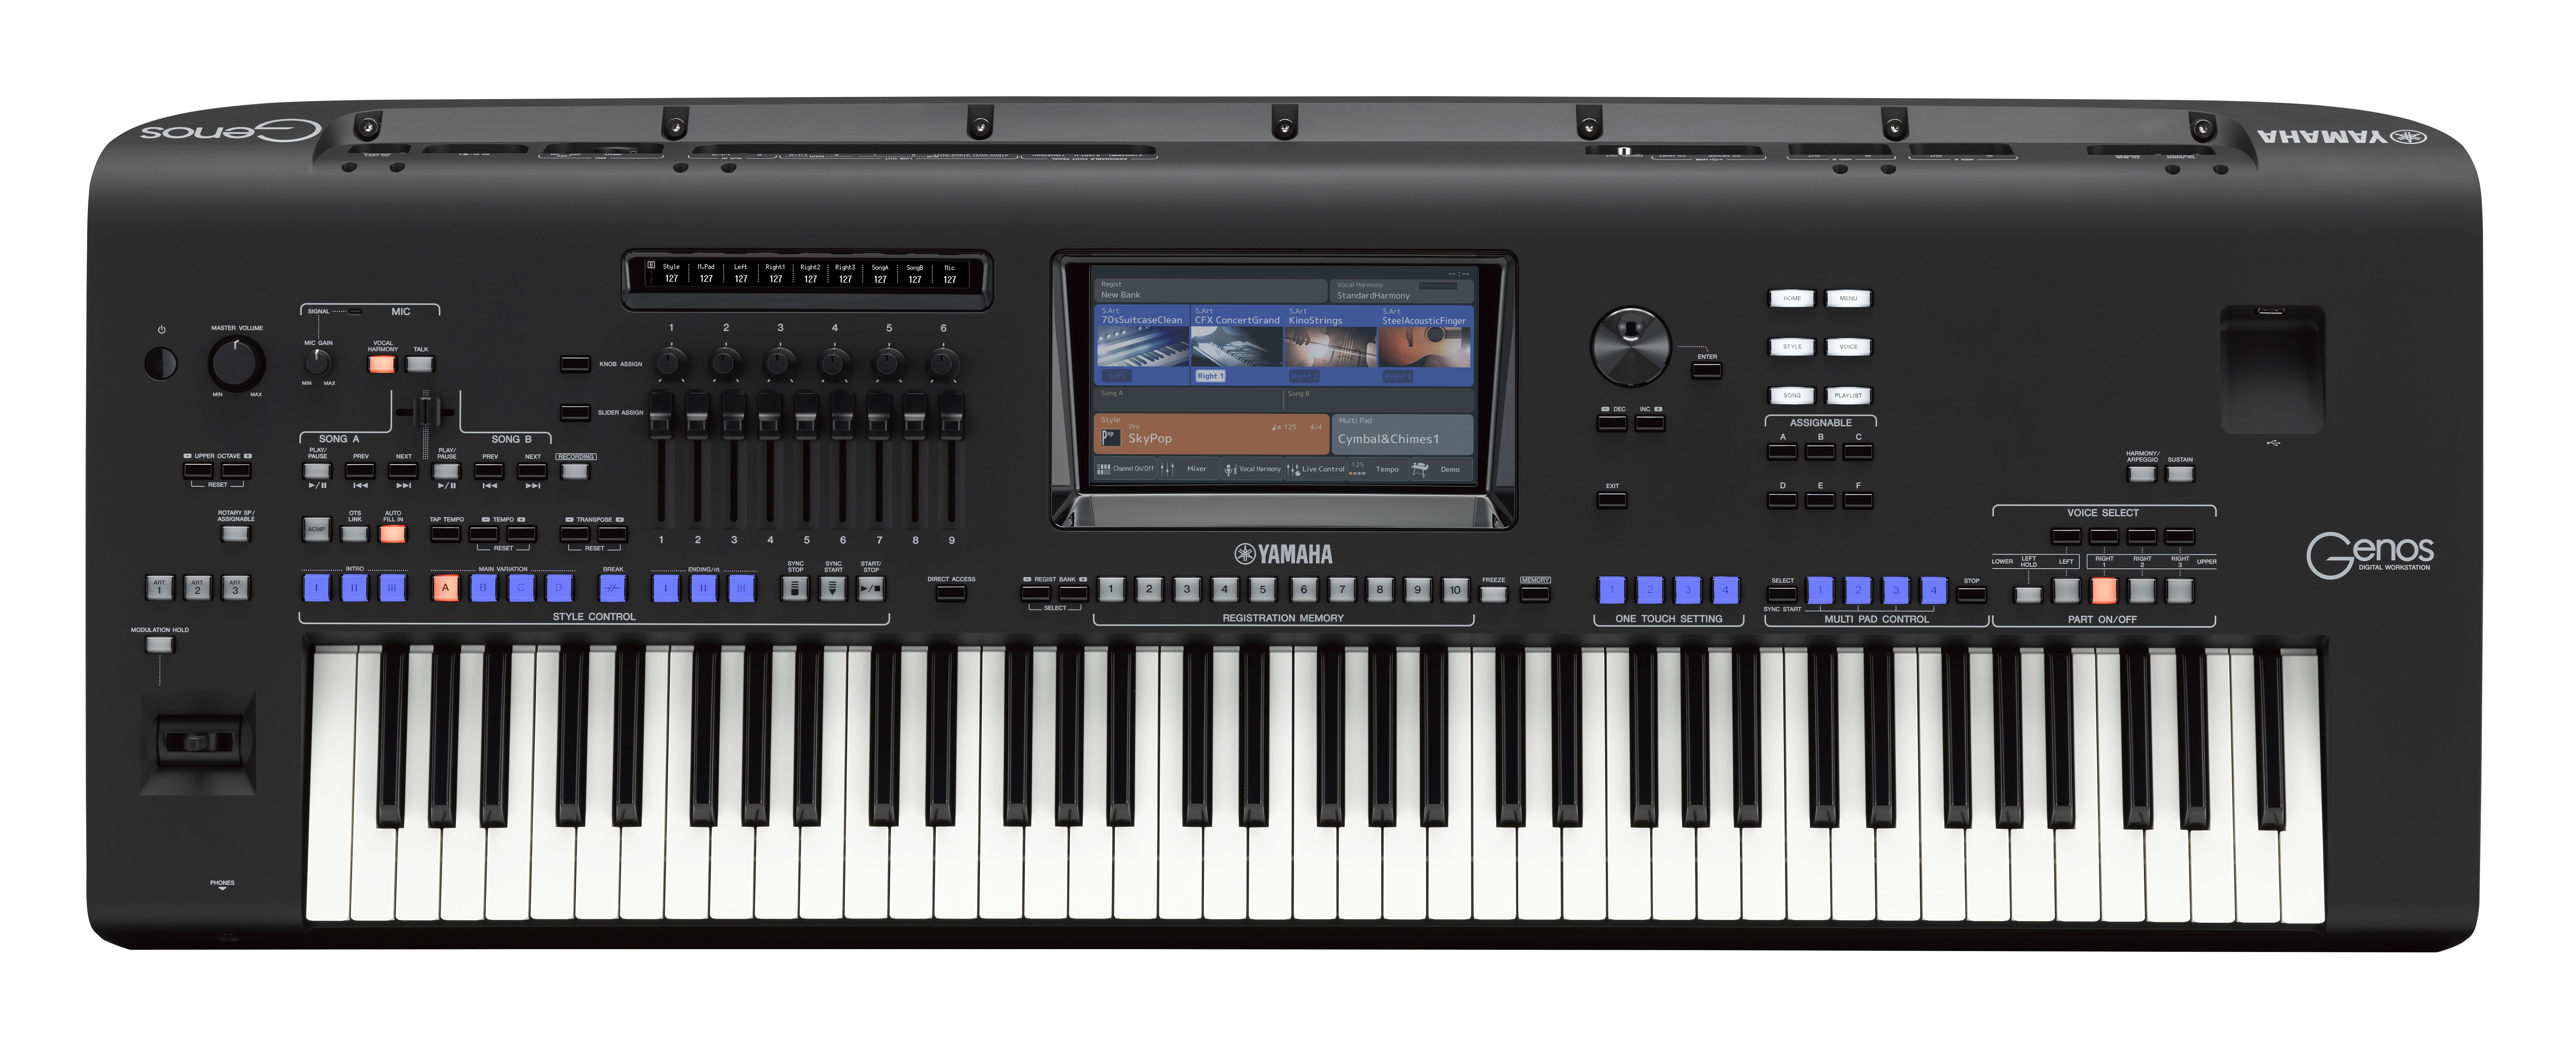 Yamaha reveals genos an innovative digital workstation for Best yamaha digital piano 2017